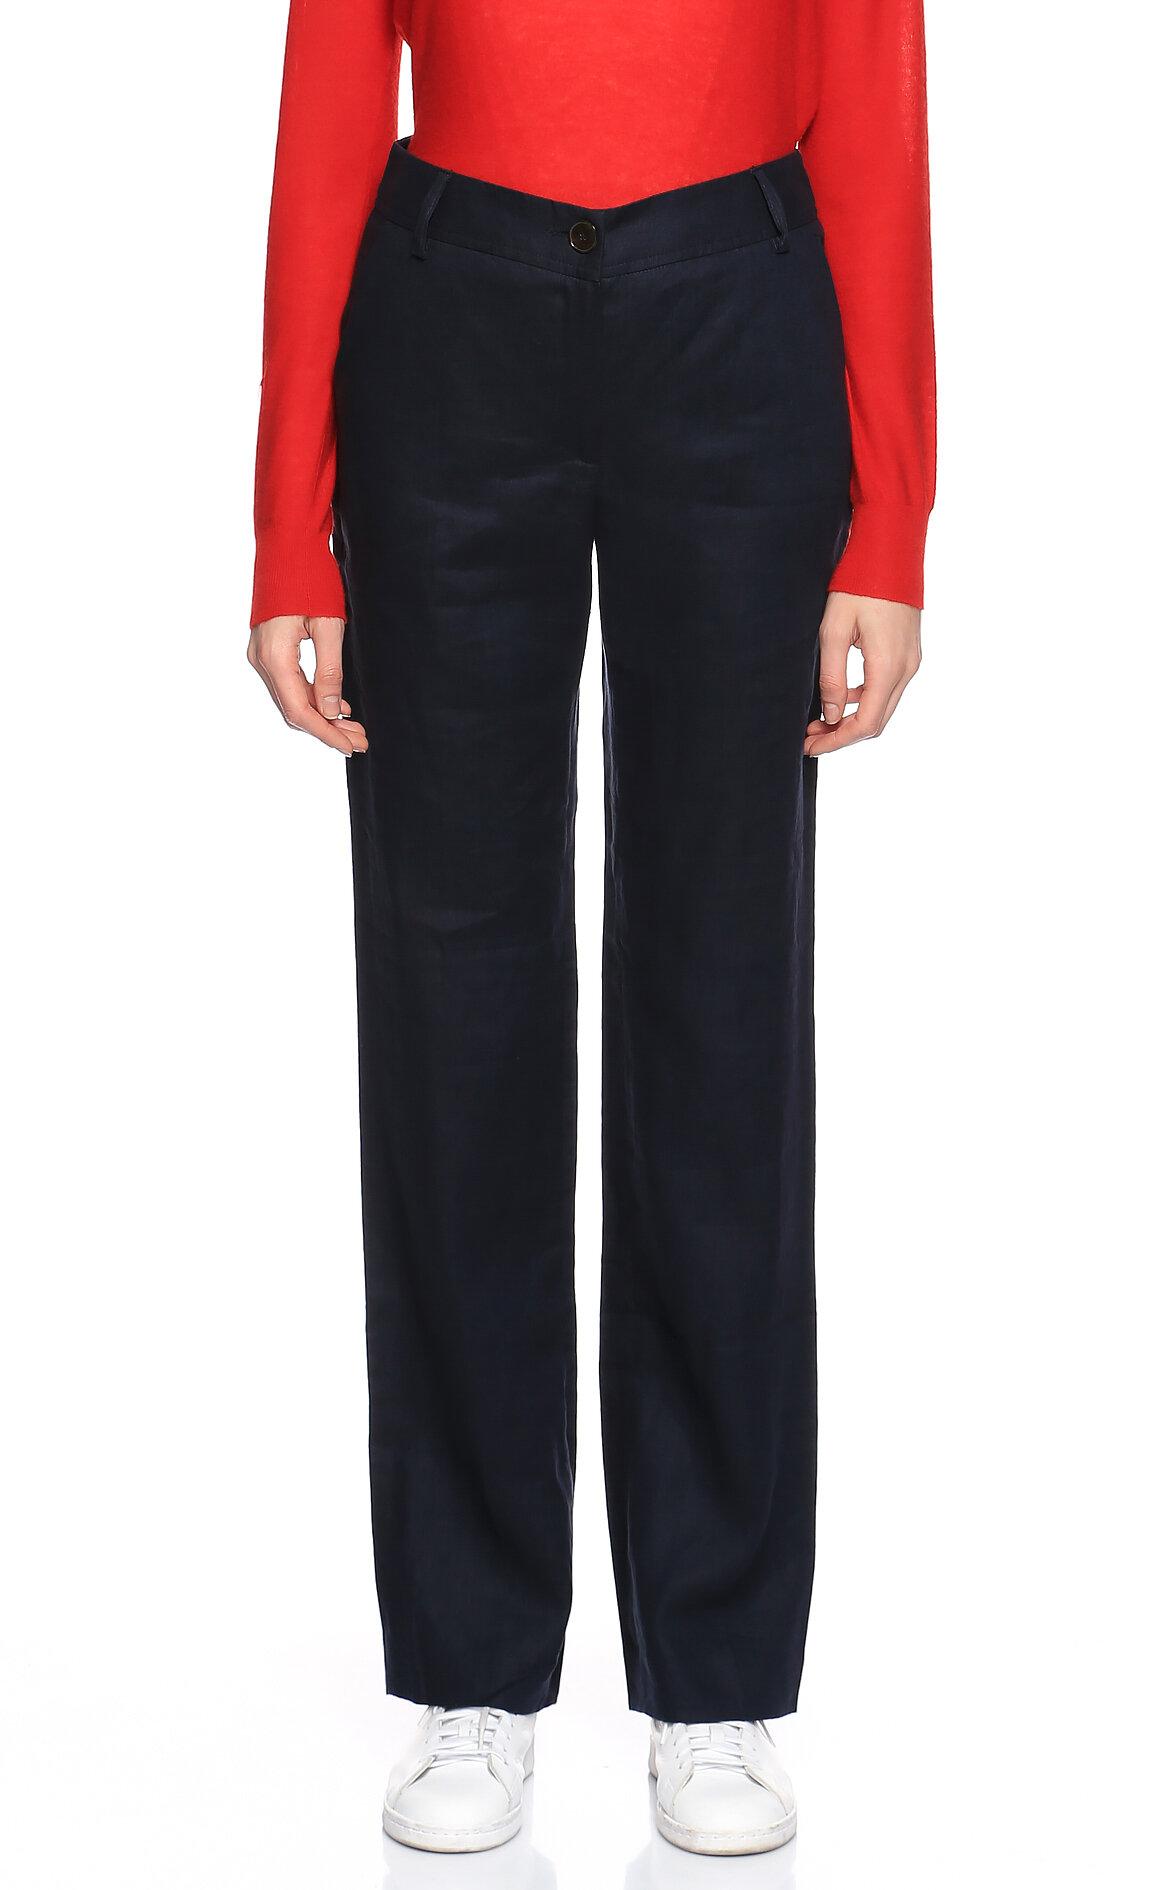 Gerard Darel-Gerard Darel Geniş Paçalı Lacivert Pantolon